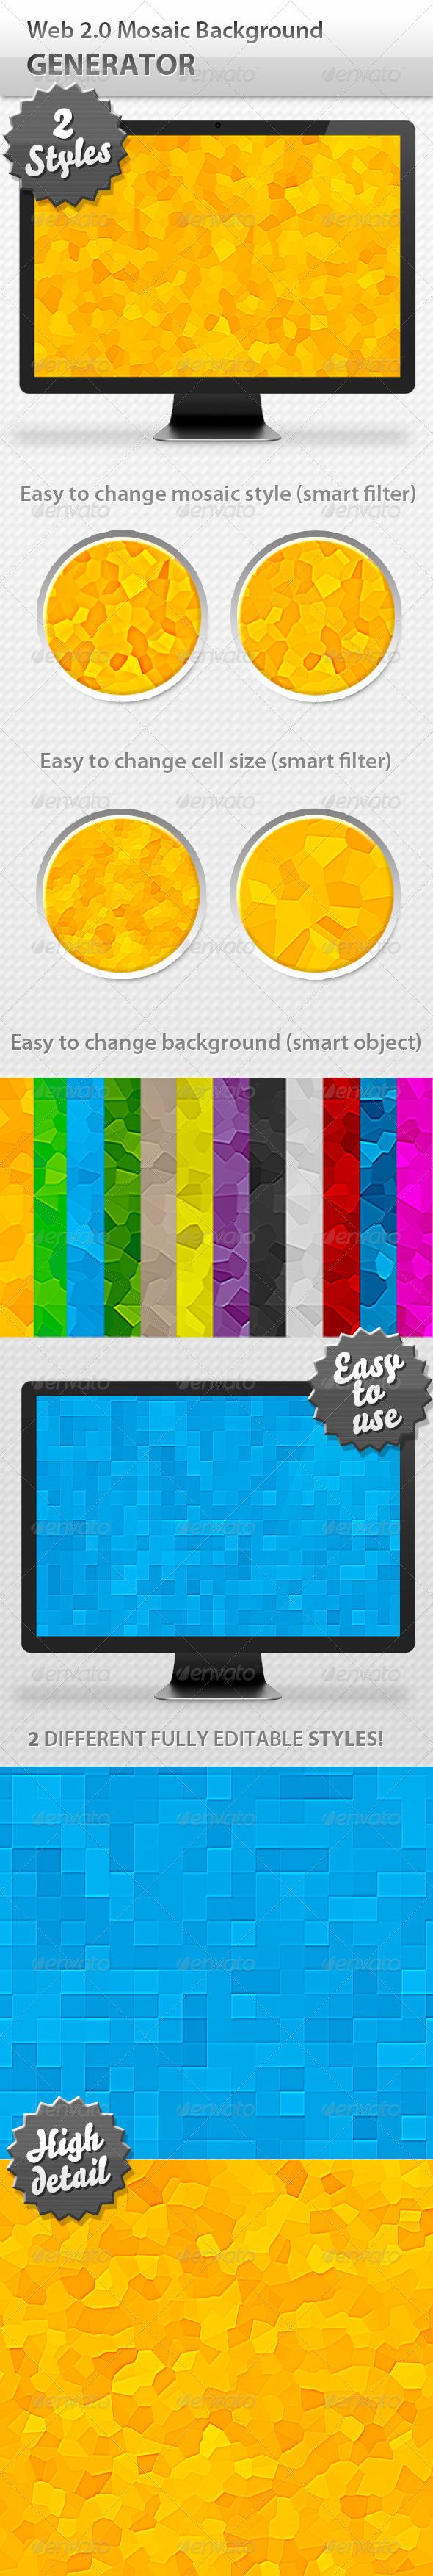 Web 20 mosaic background generator generators mosaics and font logo web 20 mosaic background generator voltagebd Image collections